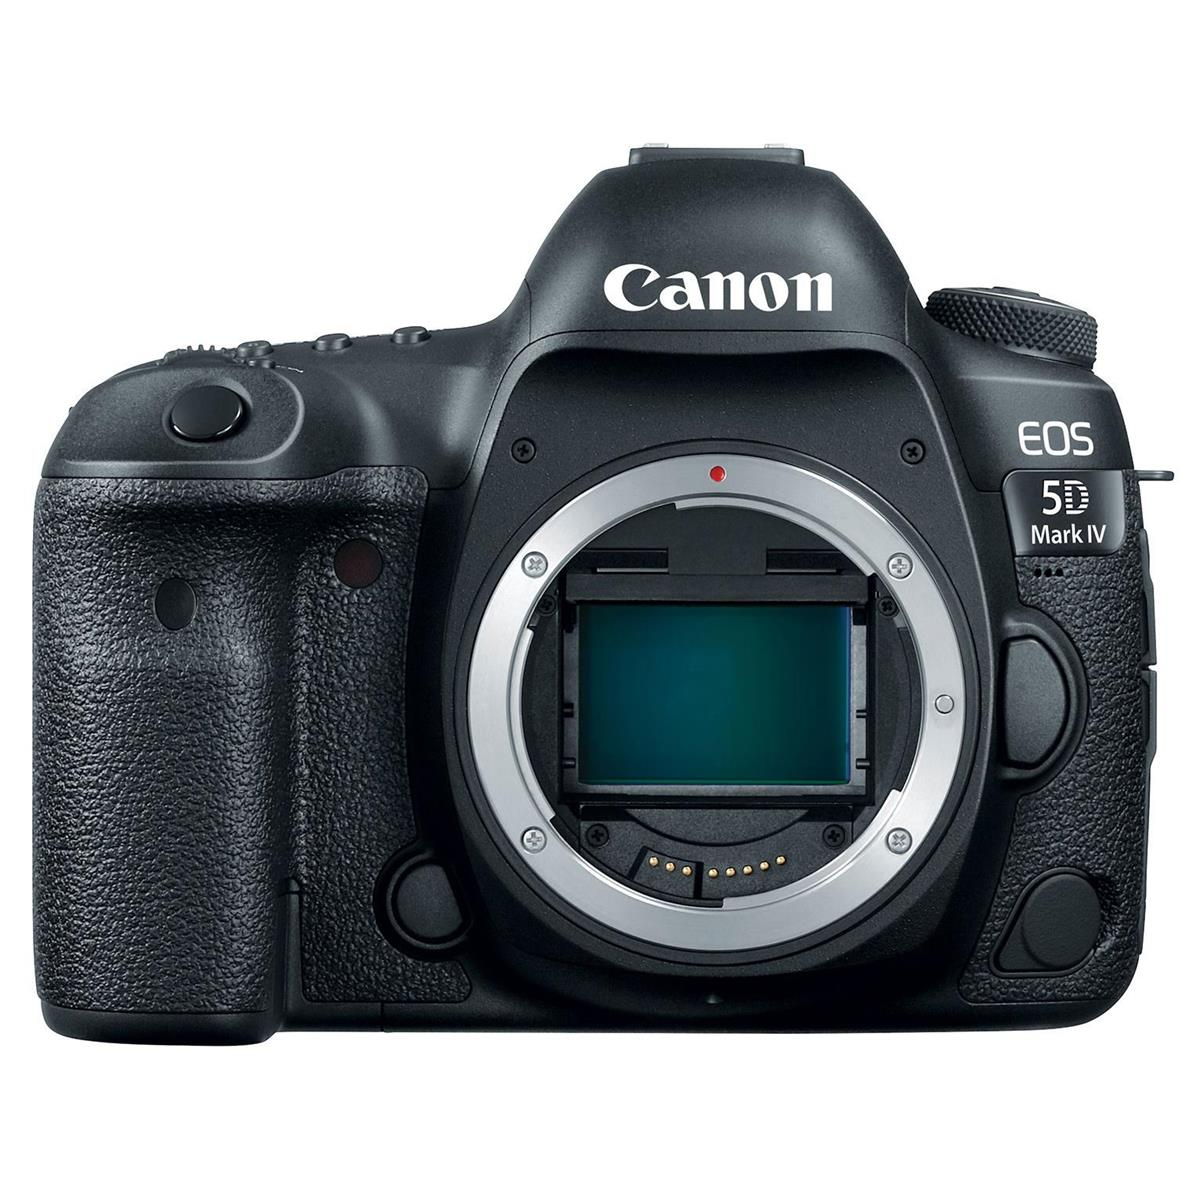 Photo from Amazon of a Canon EOS 5D Mark IV camera.